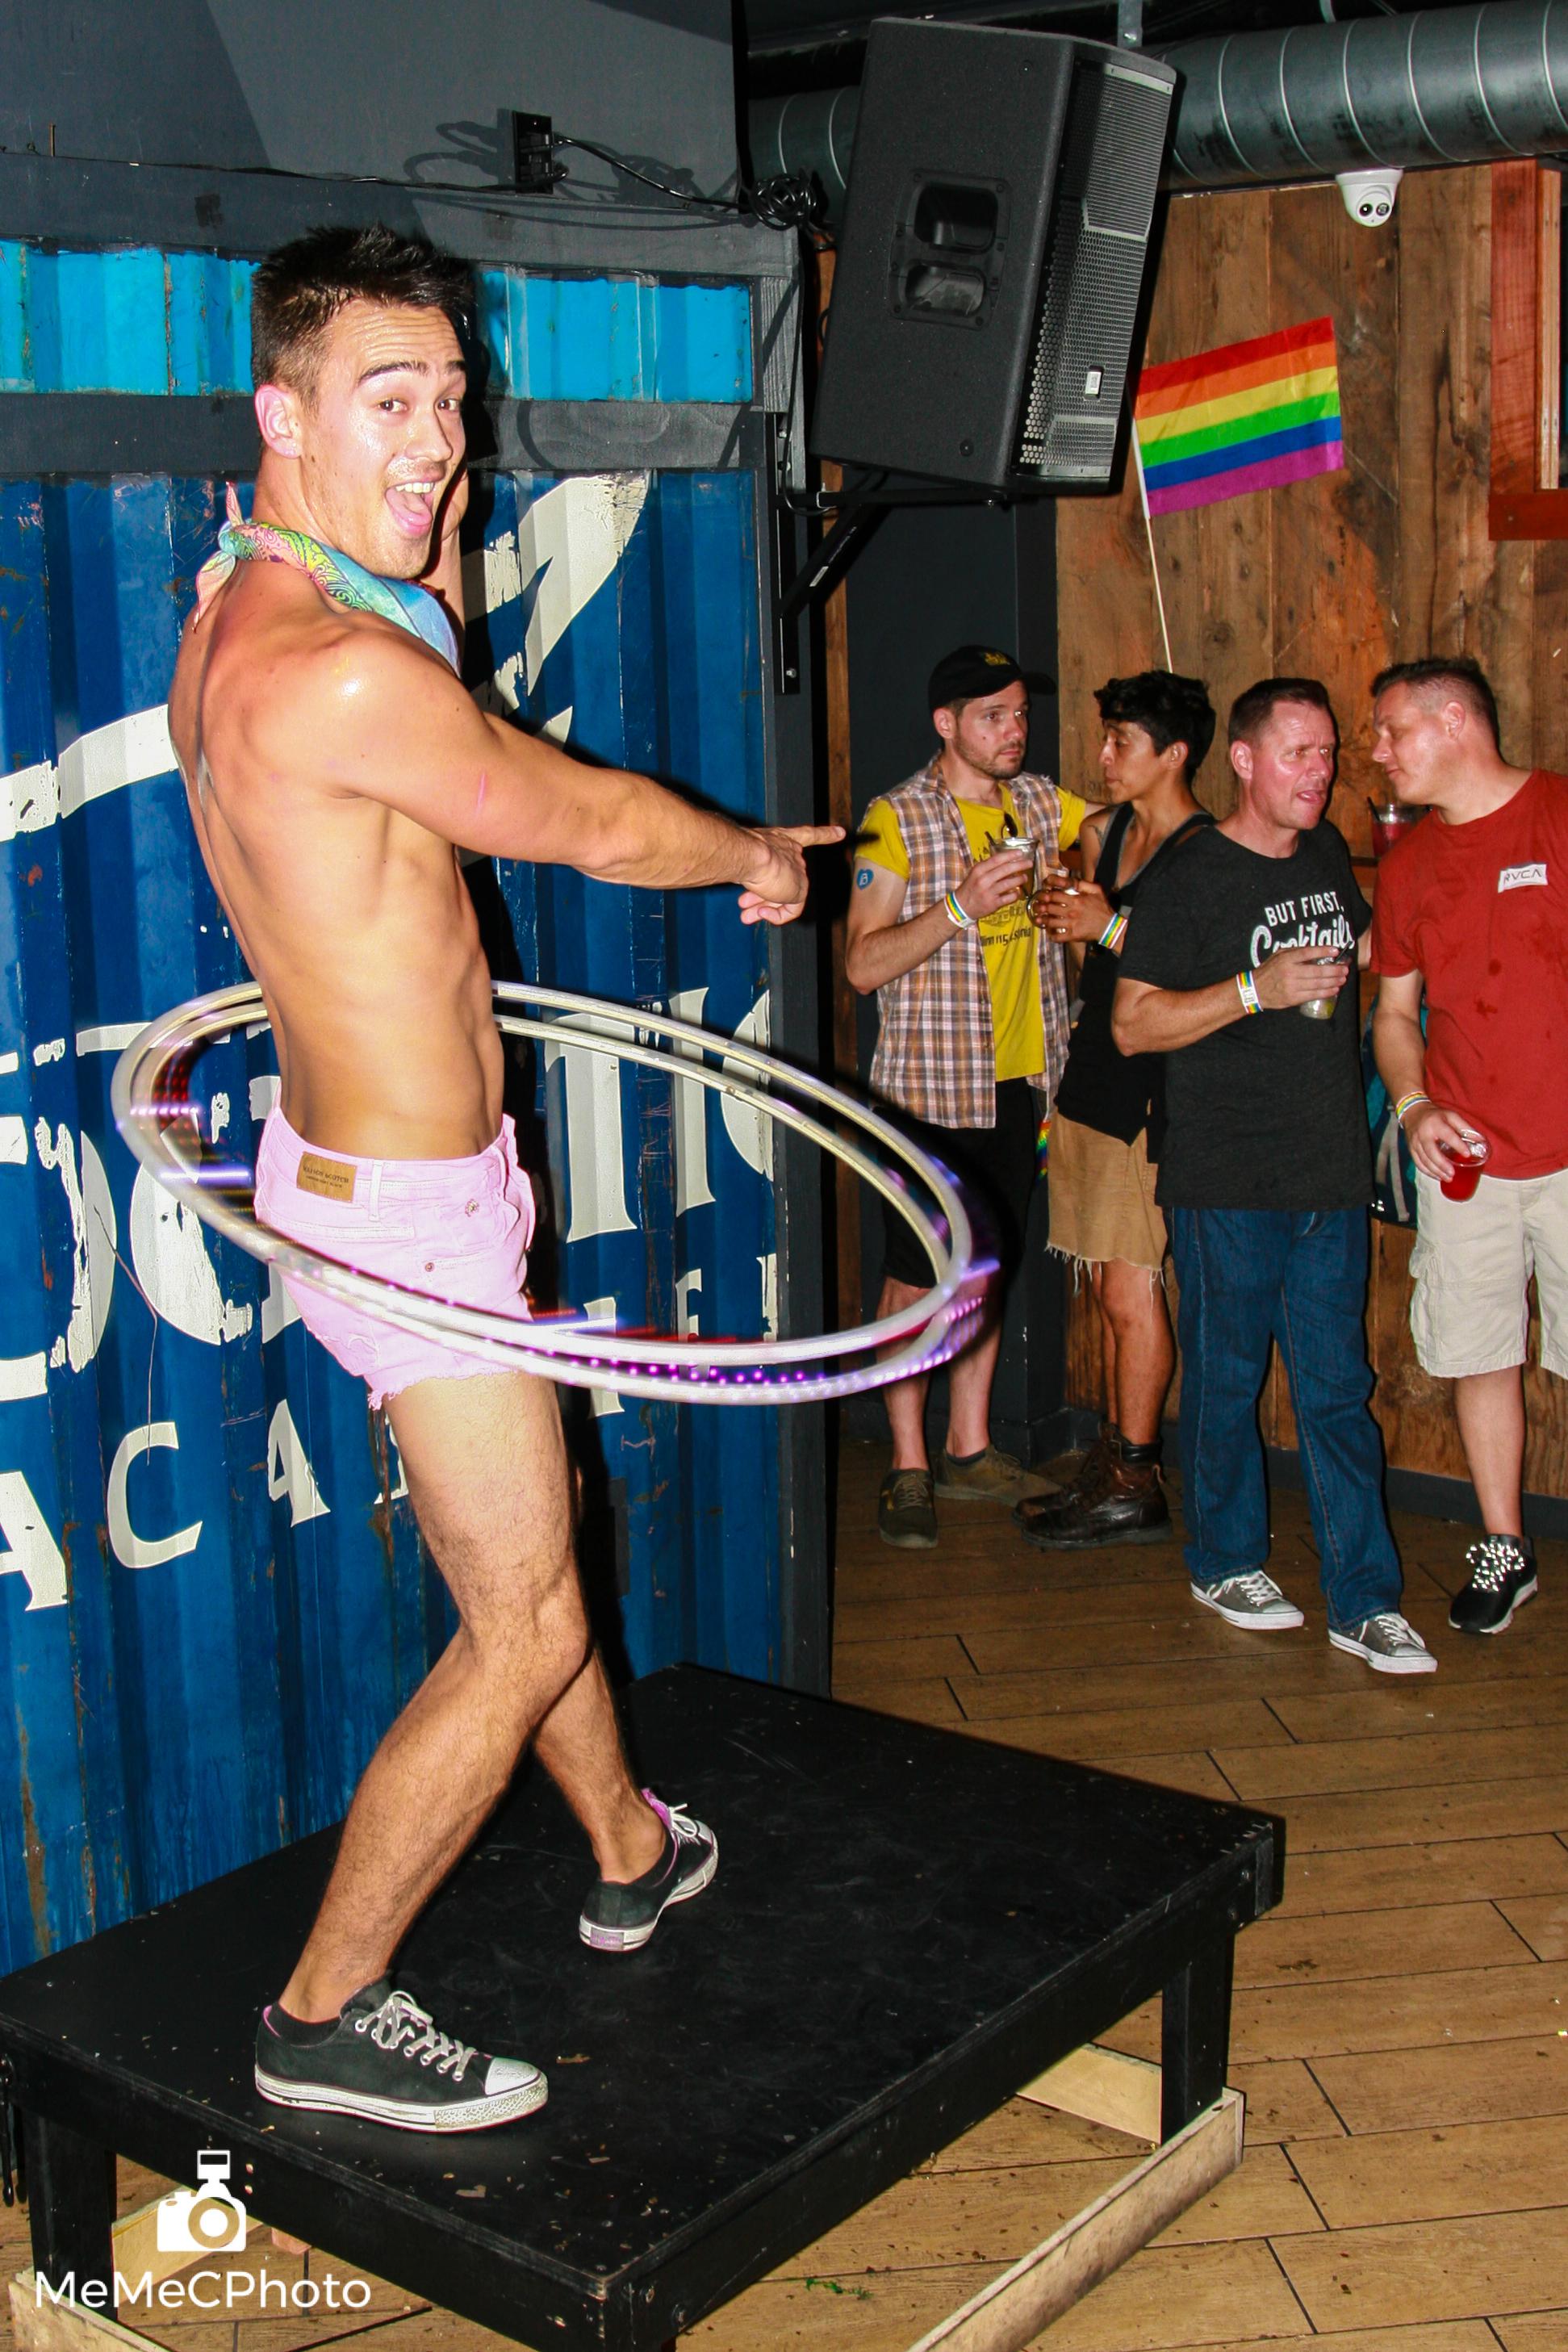 Port Bar Oakland Pride - 186-172.jpg